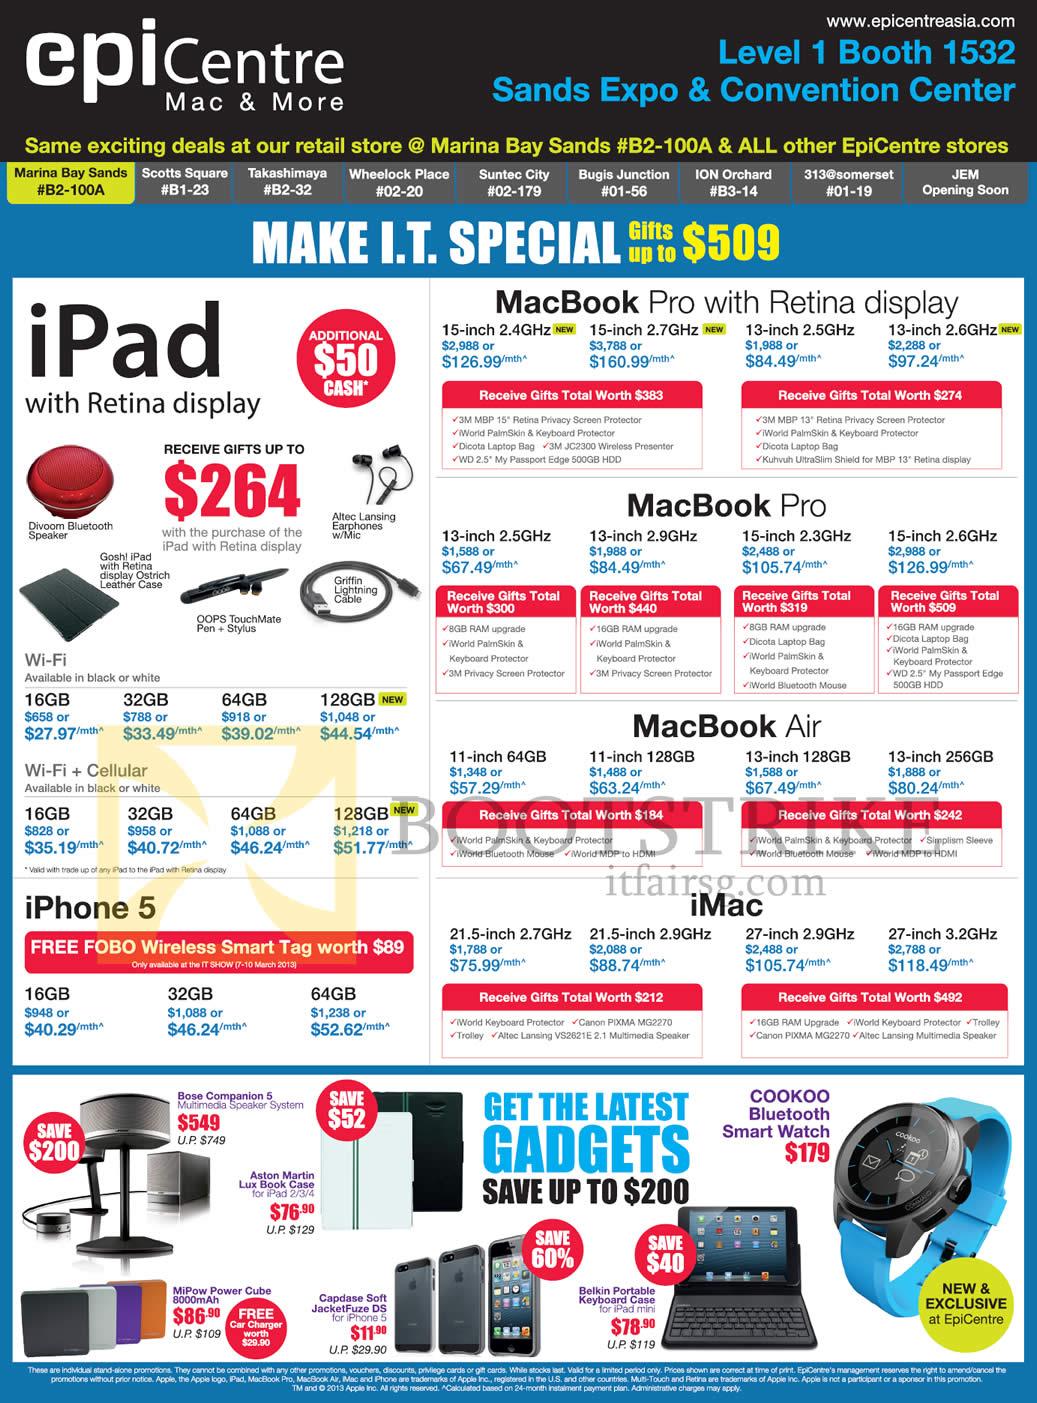 IT SHOW 2013 Price List Image Brochure Of EpiCentre Apple IPad 4 Tablet MacBook Pro